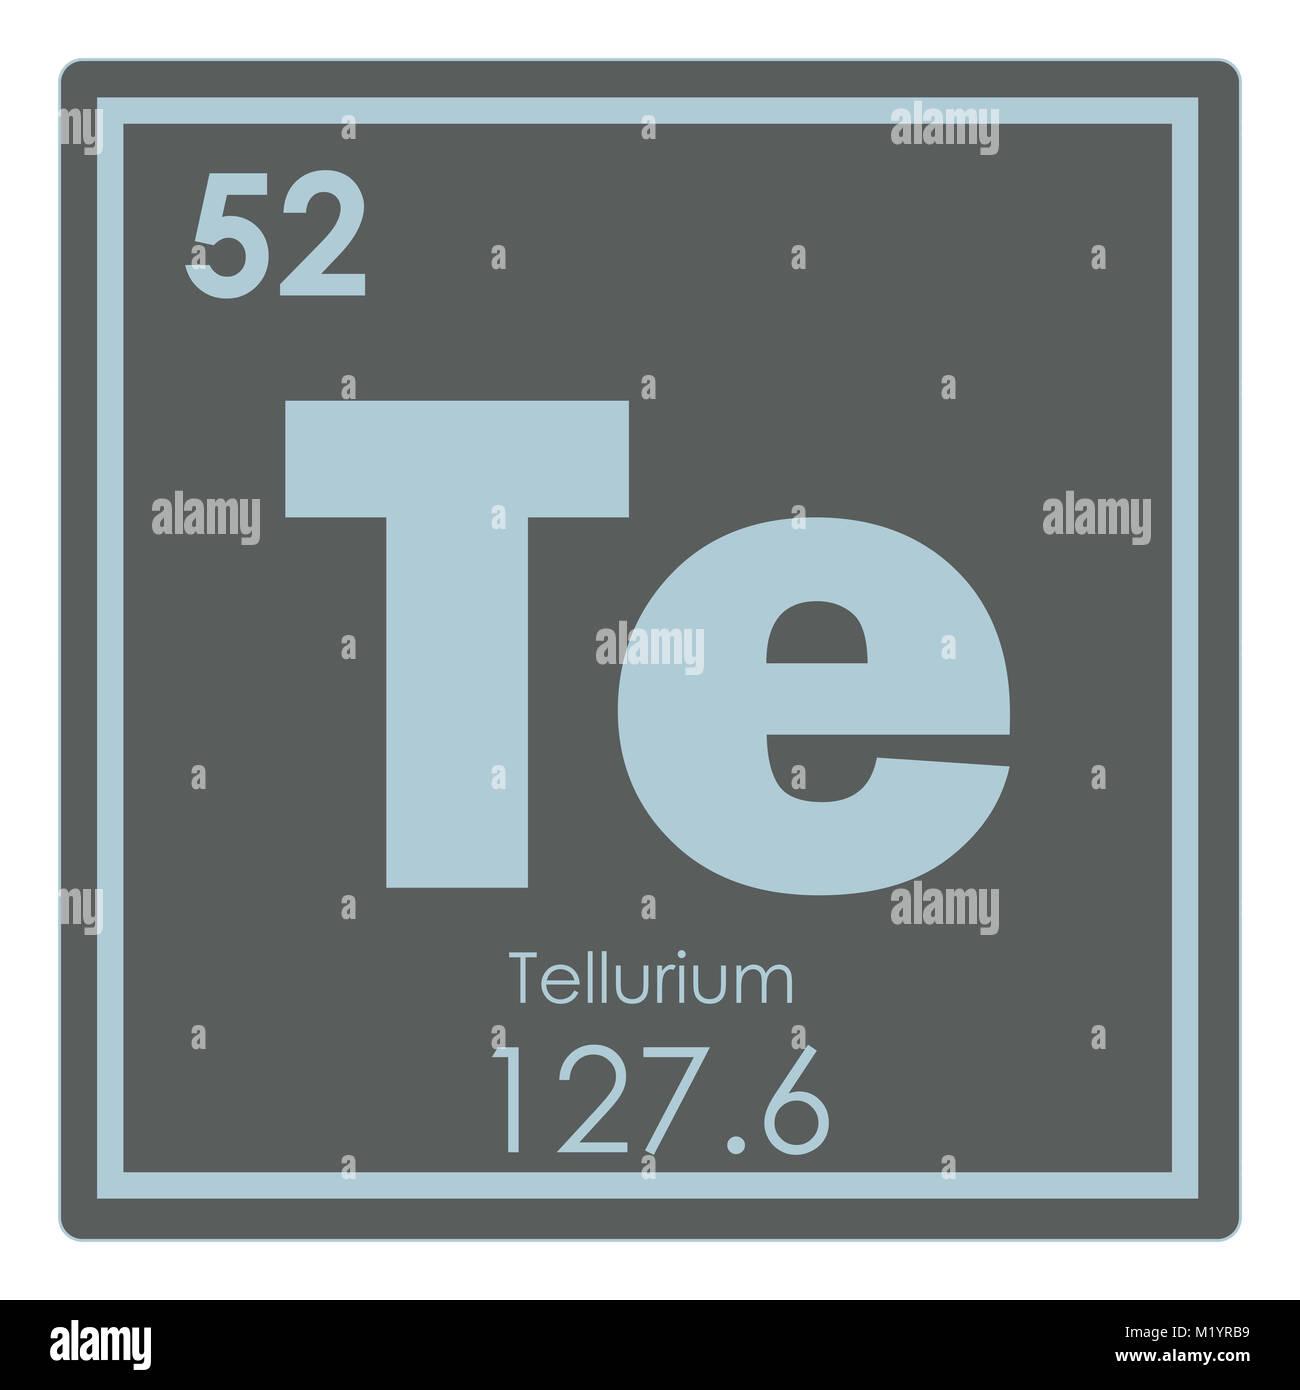 El teluro elemento qumico tabla peridica ciencia smbolo foto el teluro elemento qumico tabla peridica ciencia smbolo urtaz Gallery